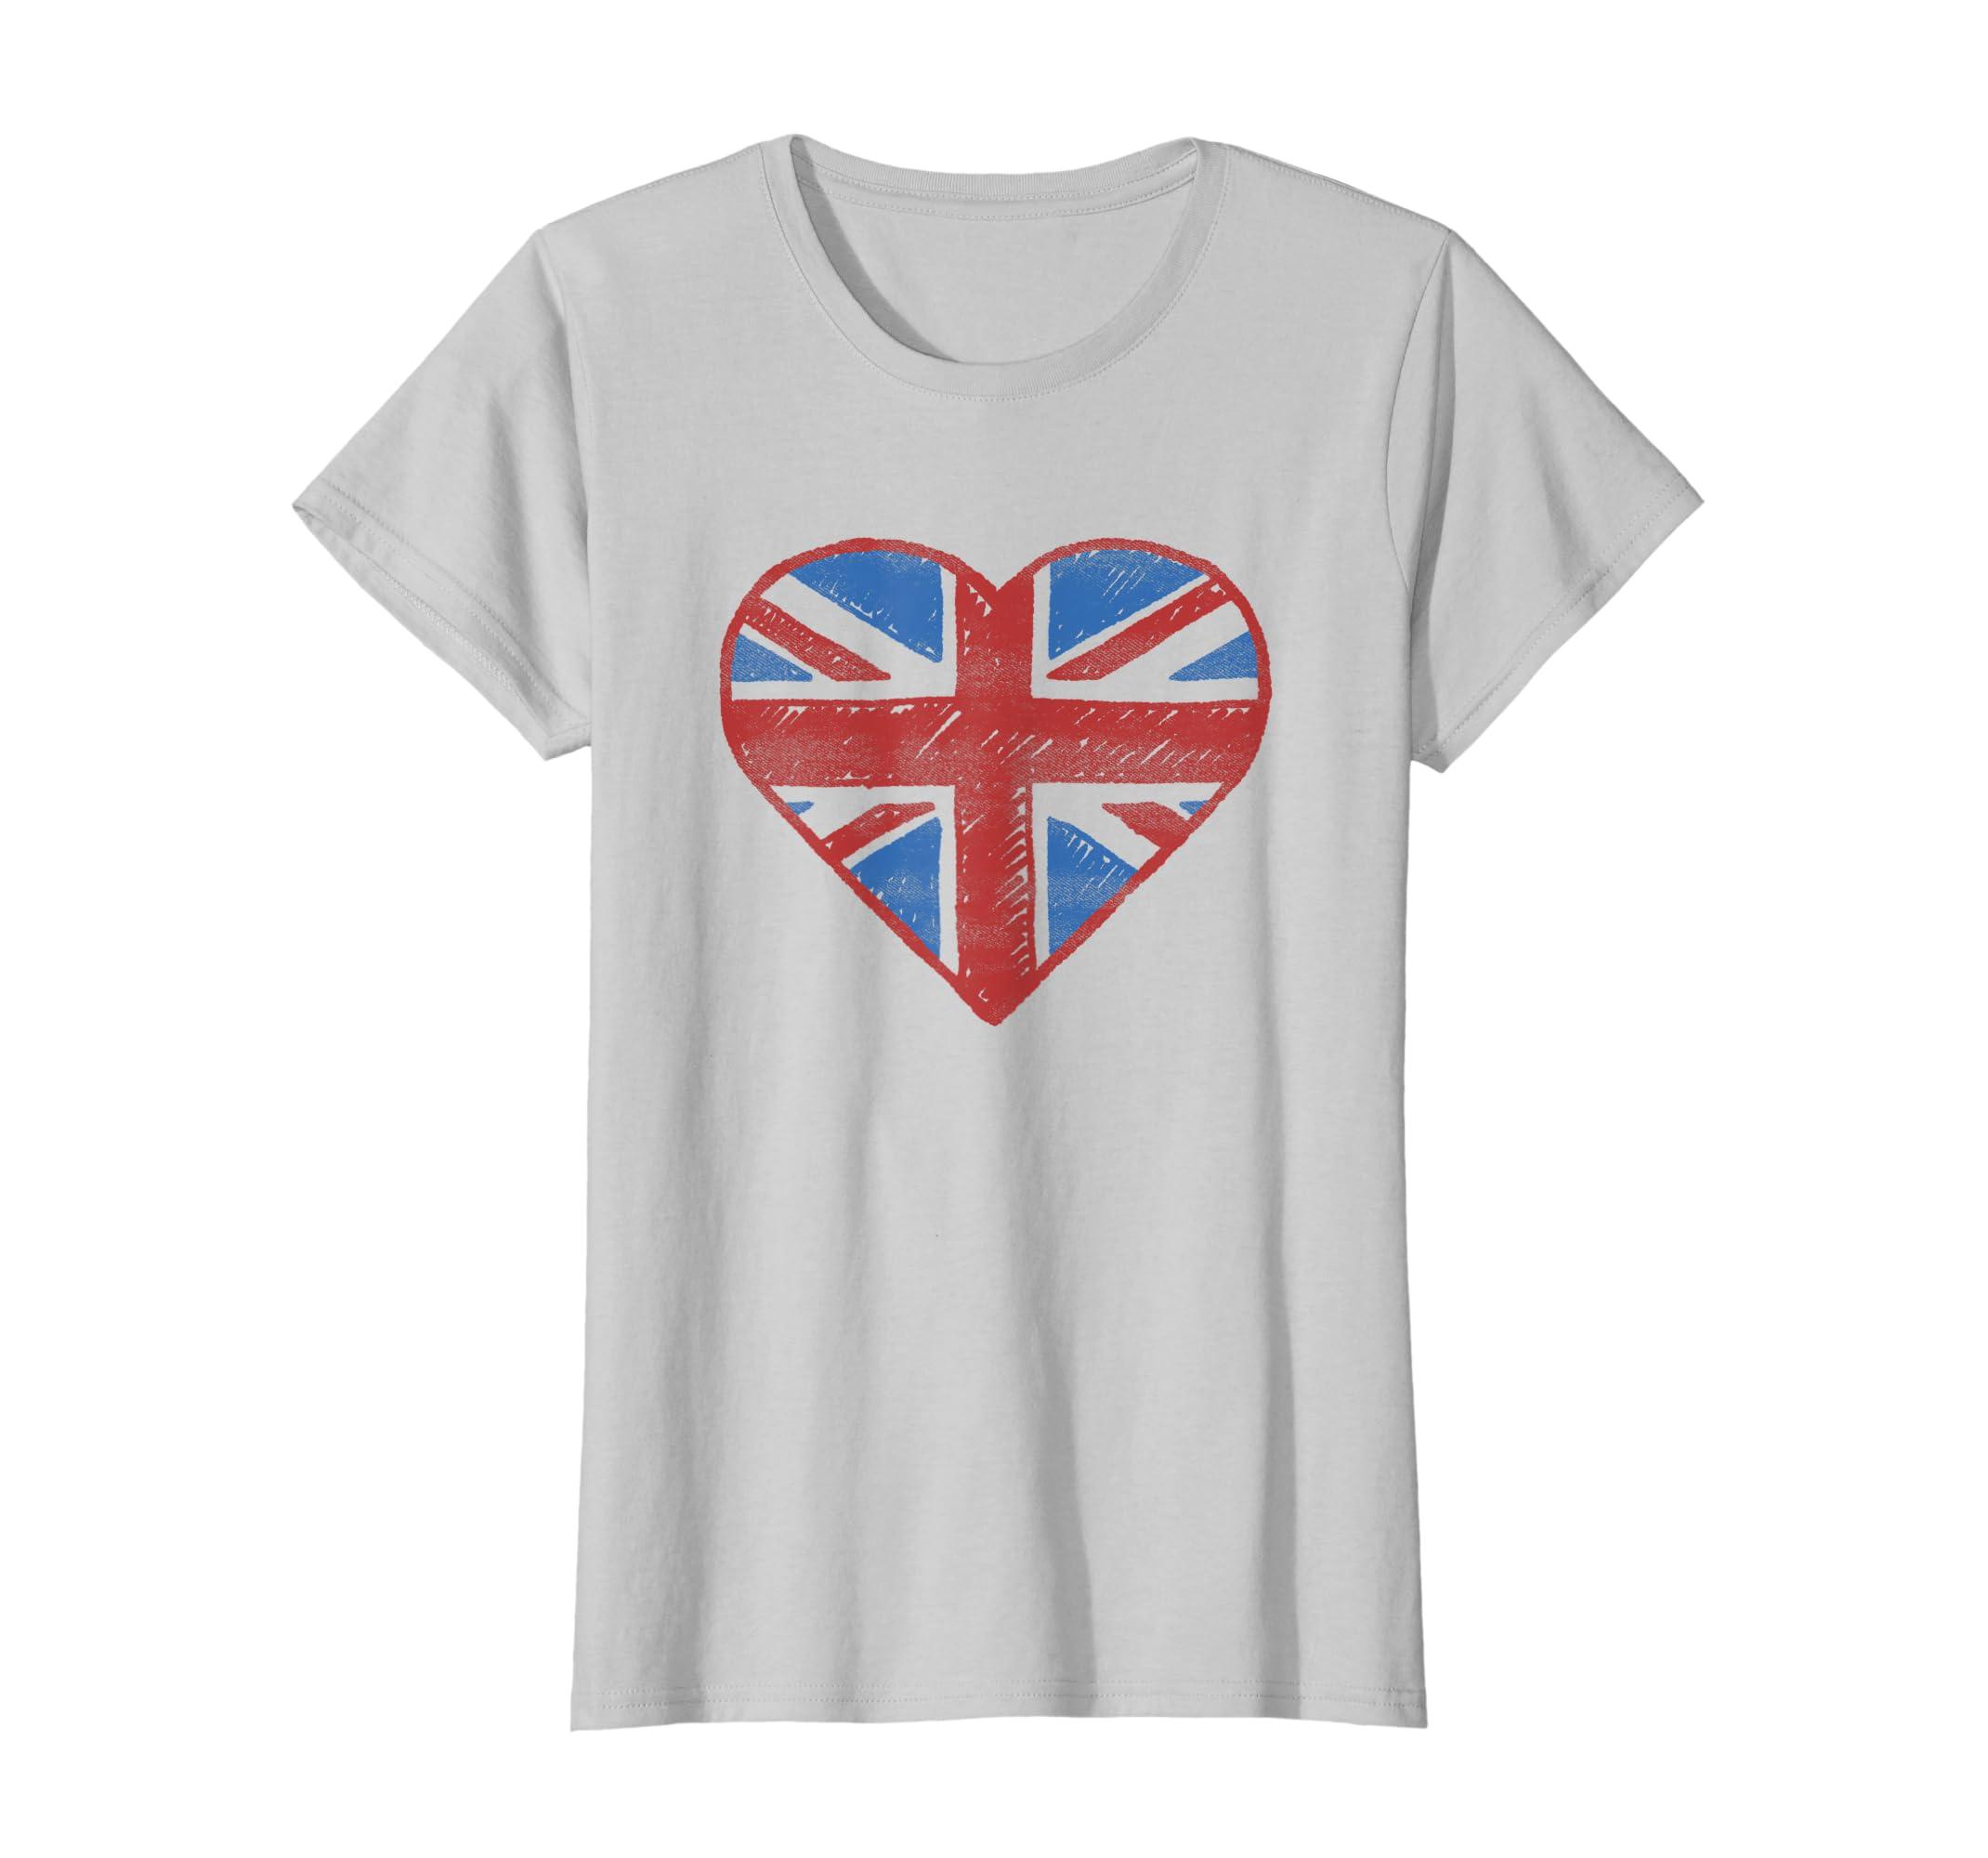 2327072e8 Amazon.com: UK Flag T shirt - British Flag Shirt Women Kids Girls Boys:  Clothing